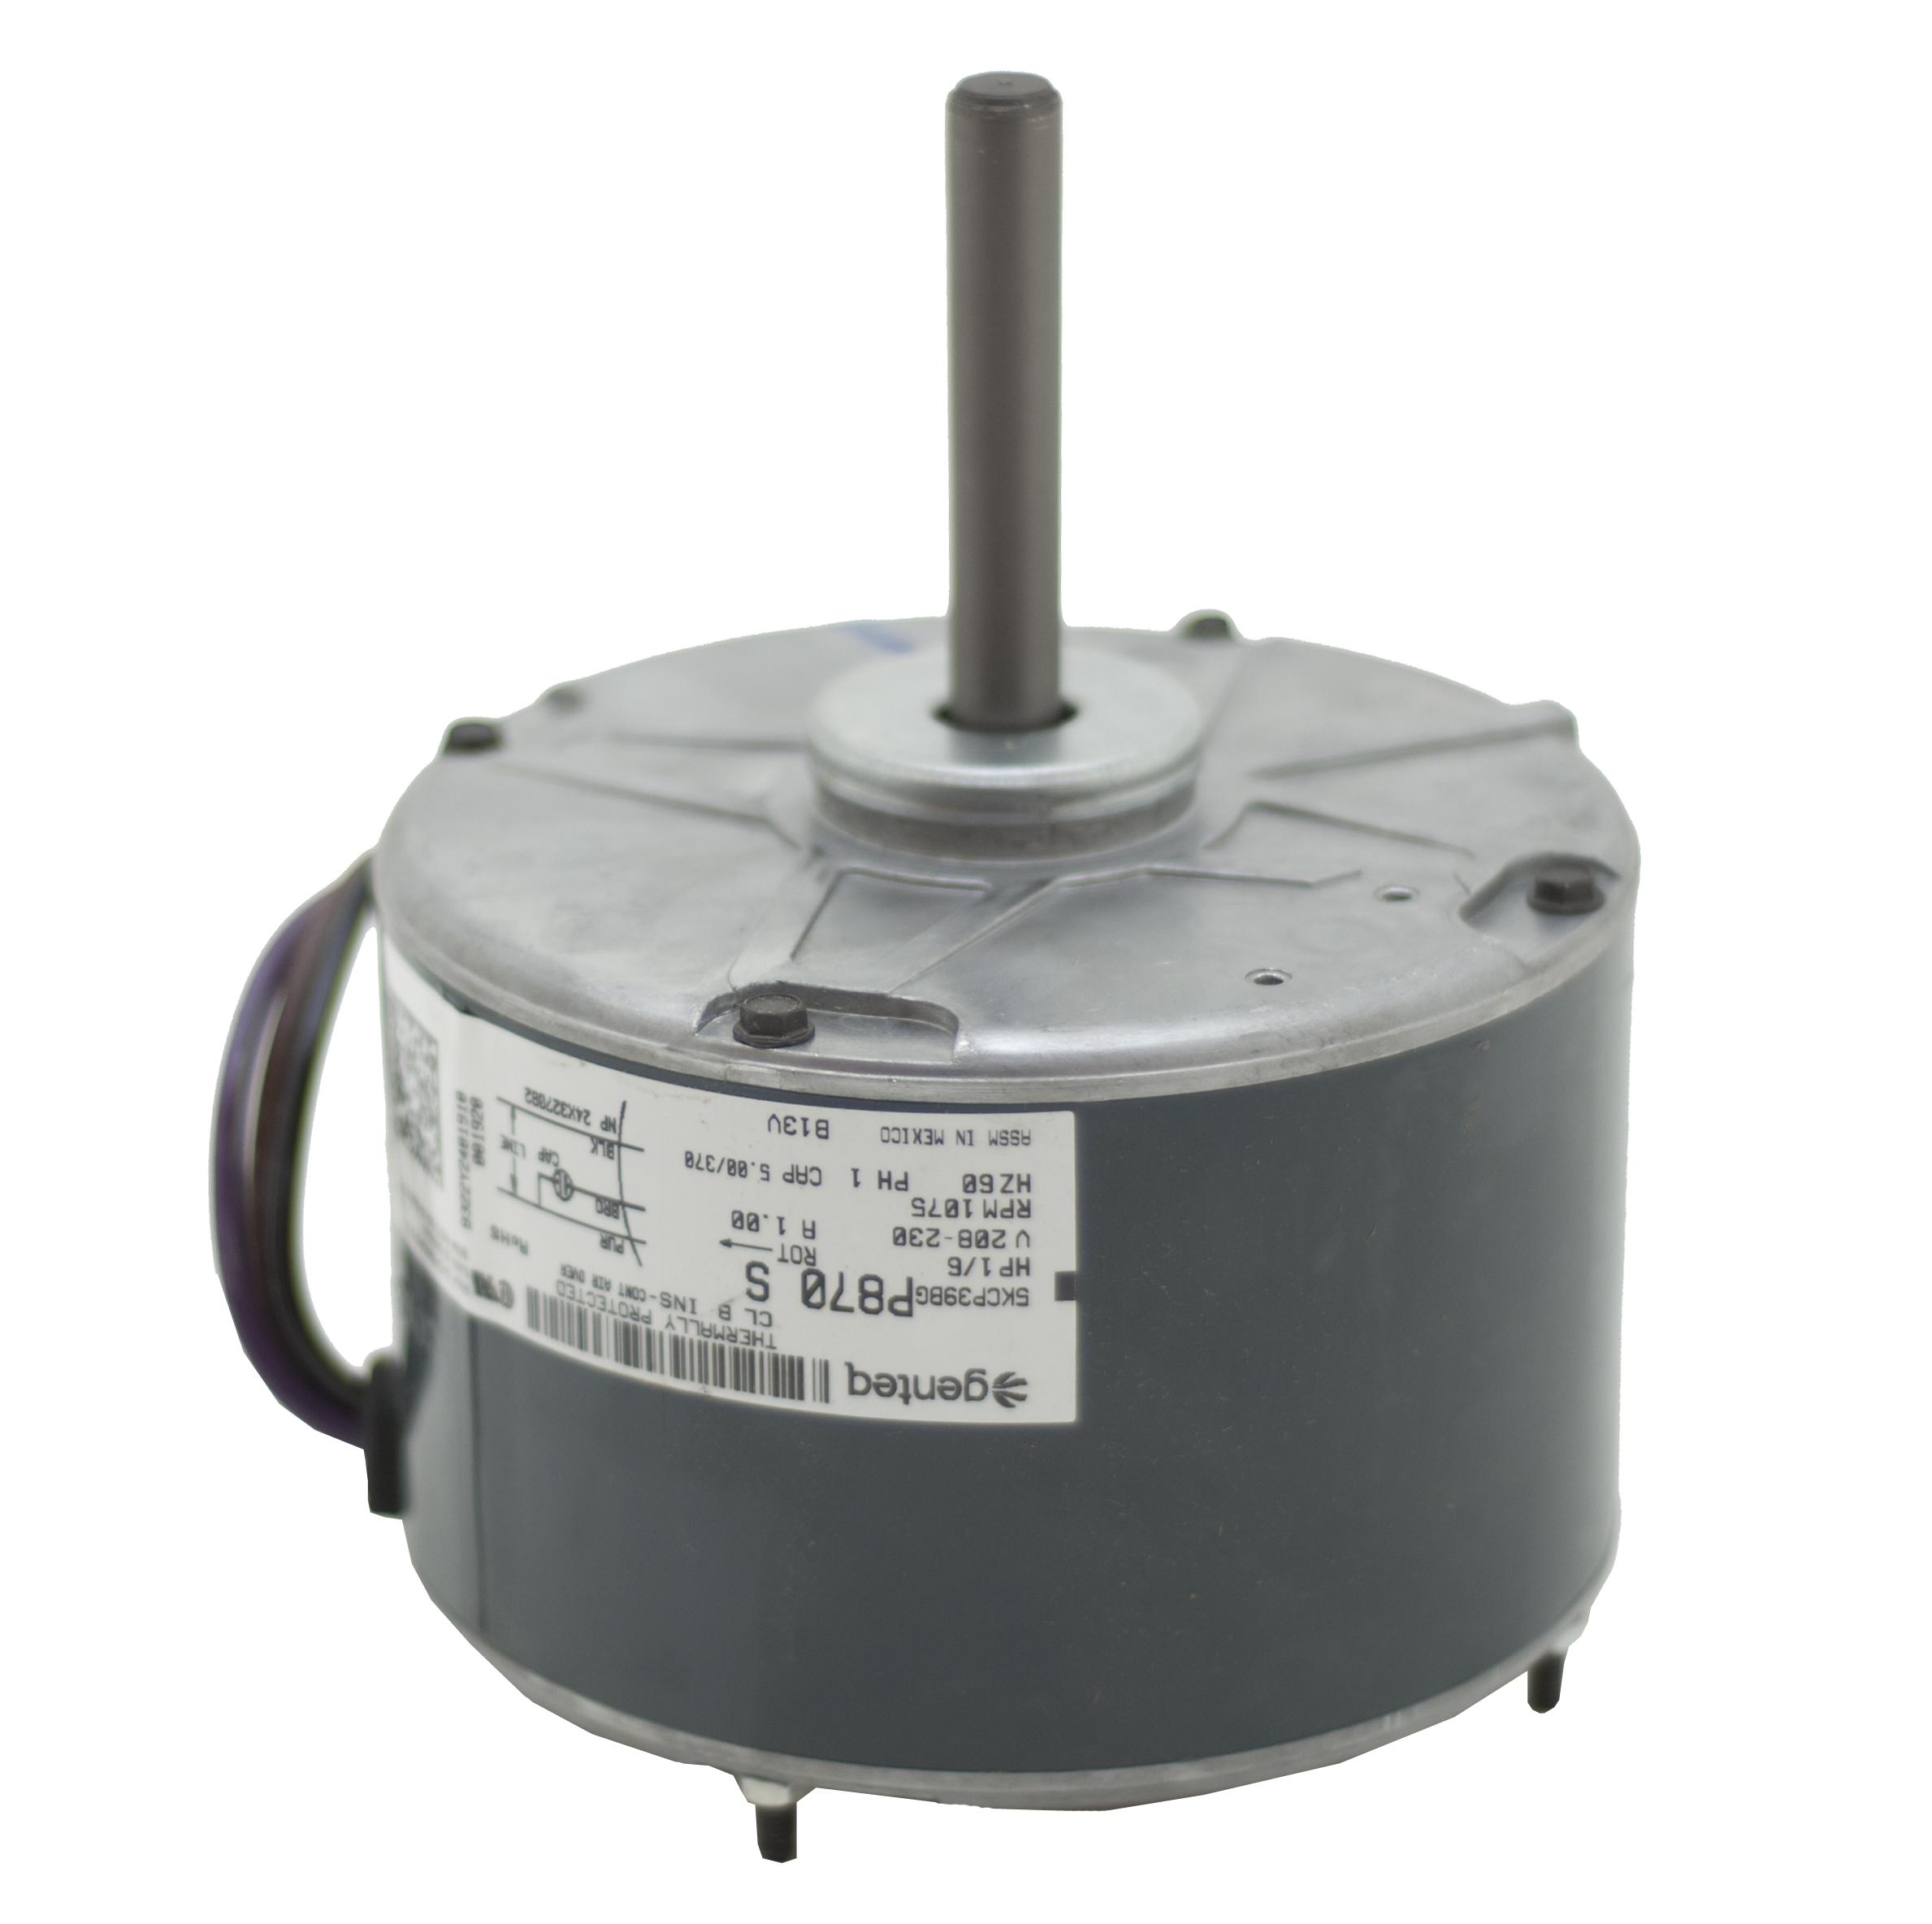 fan motor capacitor wiring diagram bazooka tube condenser  b13400251s janitrol goodman 1 6 hp